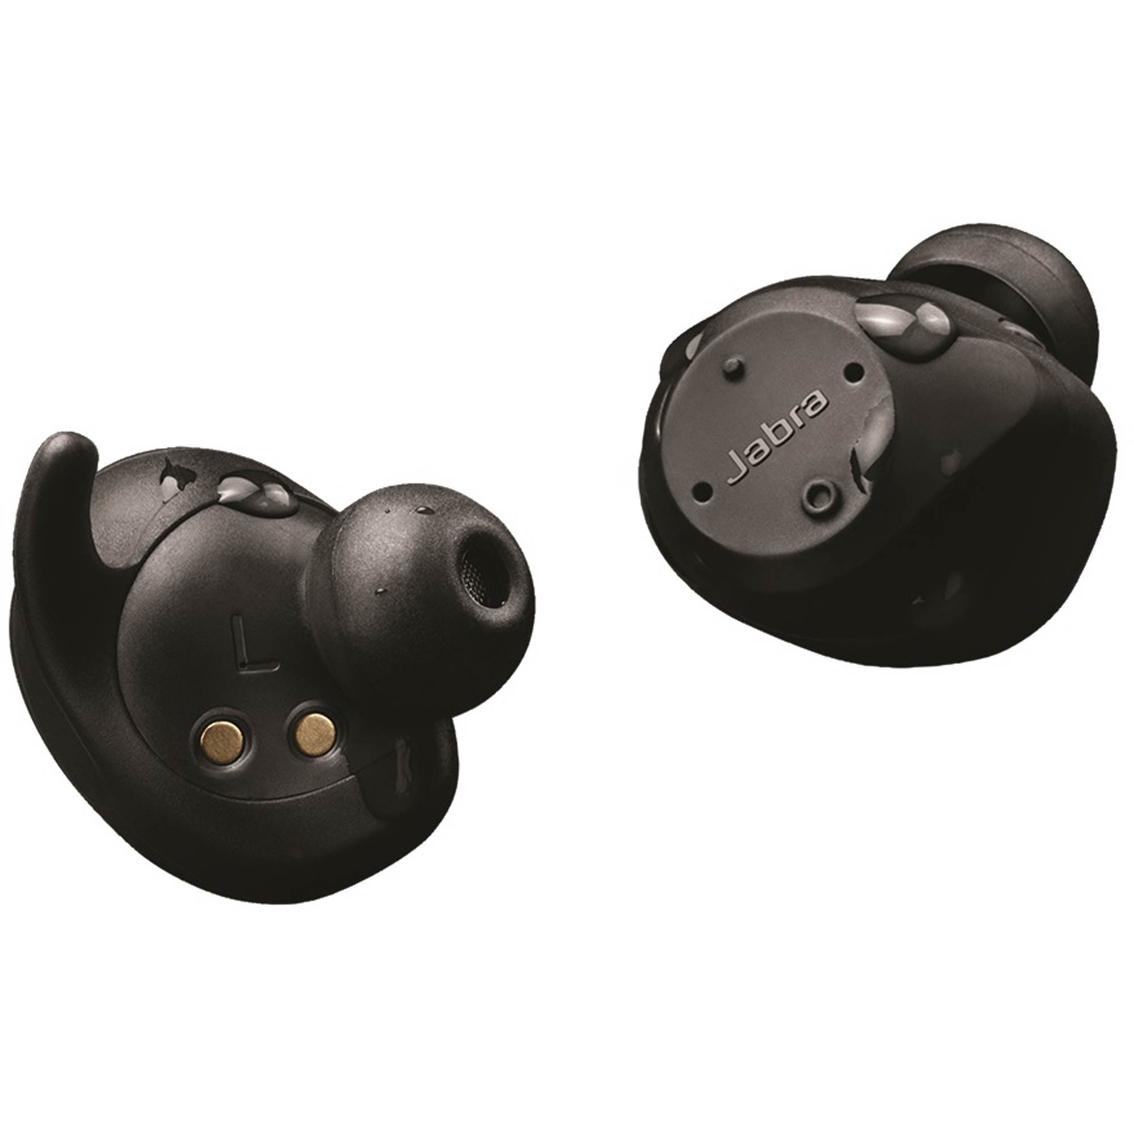 jabra elite sport true wireless in ear headphones. Black Bedroom Furniture Sets. Home Design Ideas